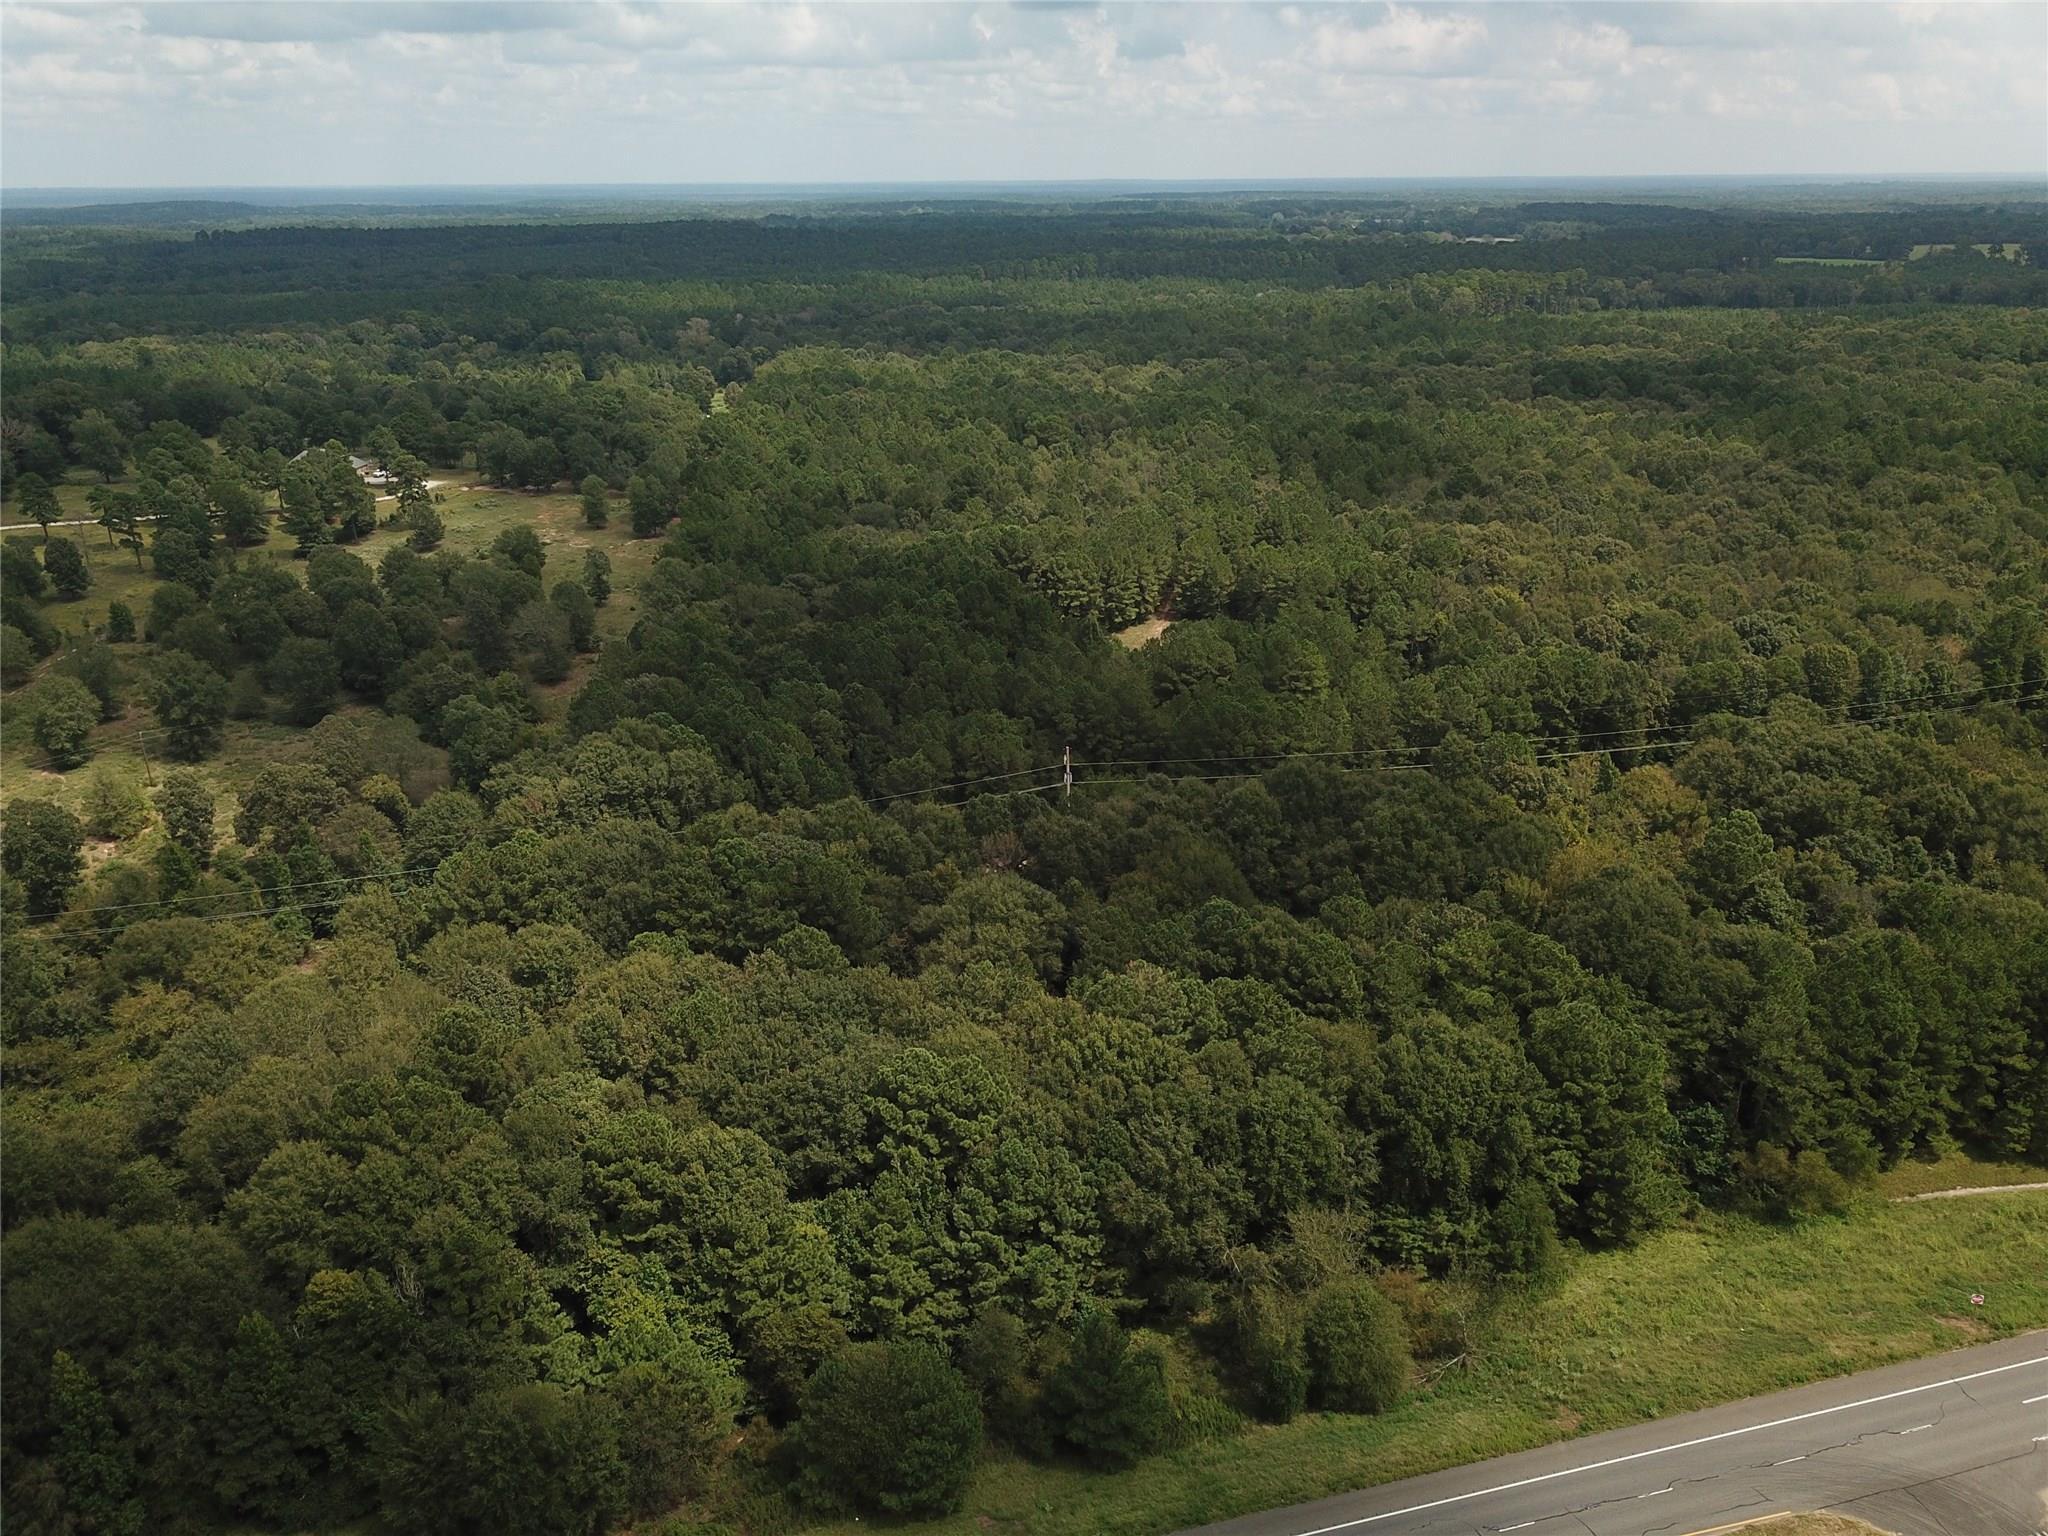 000 US Hwy 59 S Property Photo - Tenaha, TX real estate listing